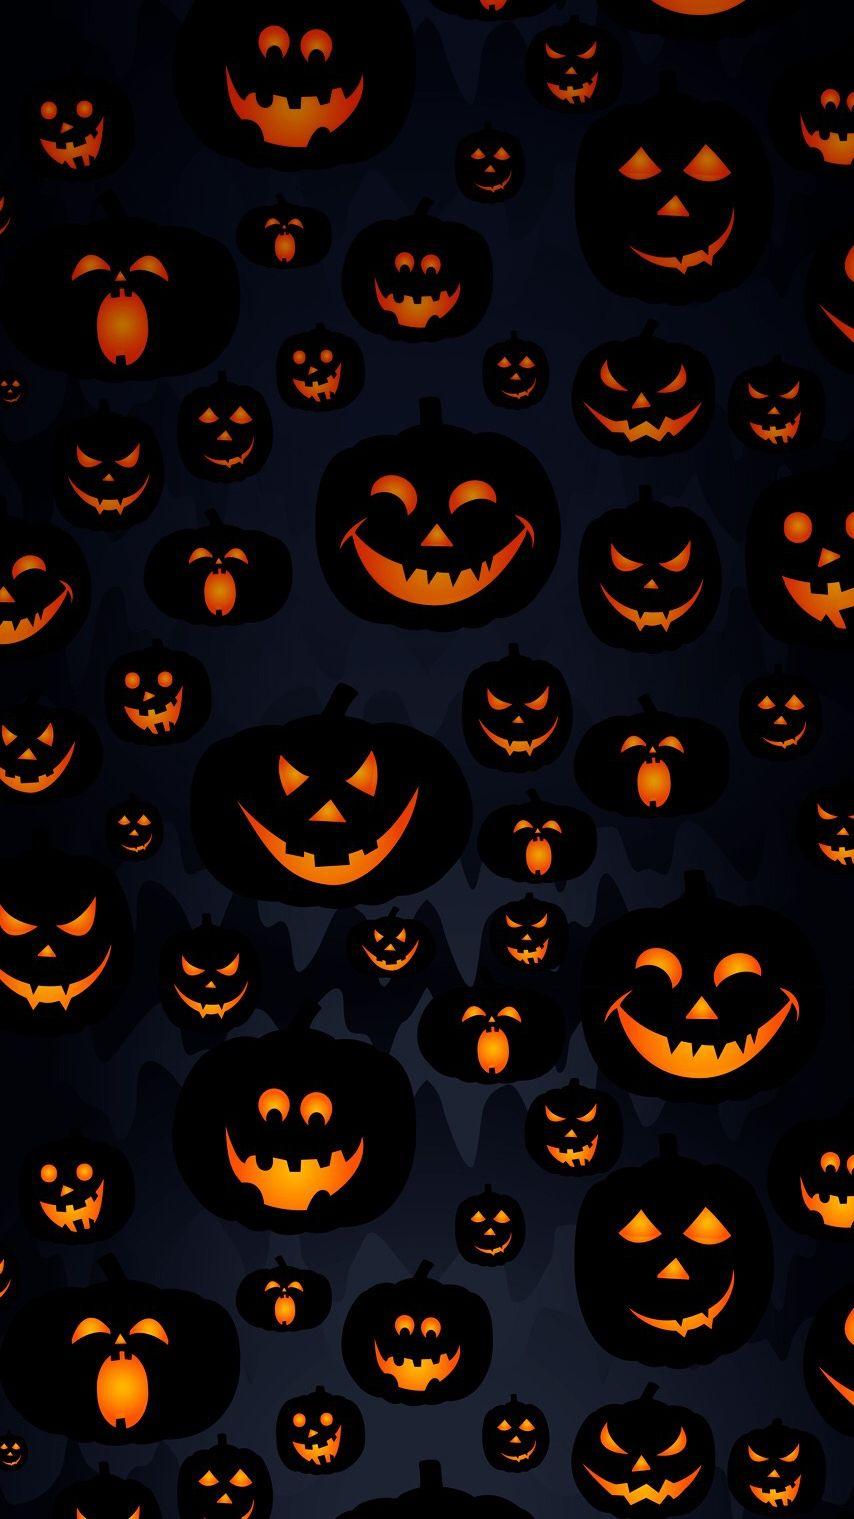 ScaryHalloweenPumpkinMasksiPhoneWallpaper Halloween